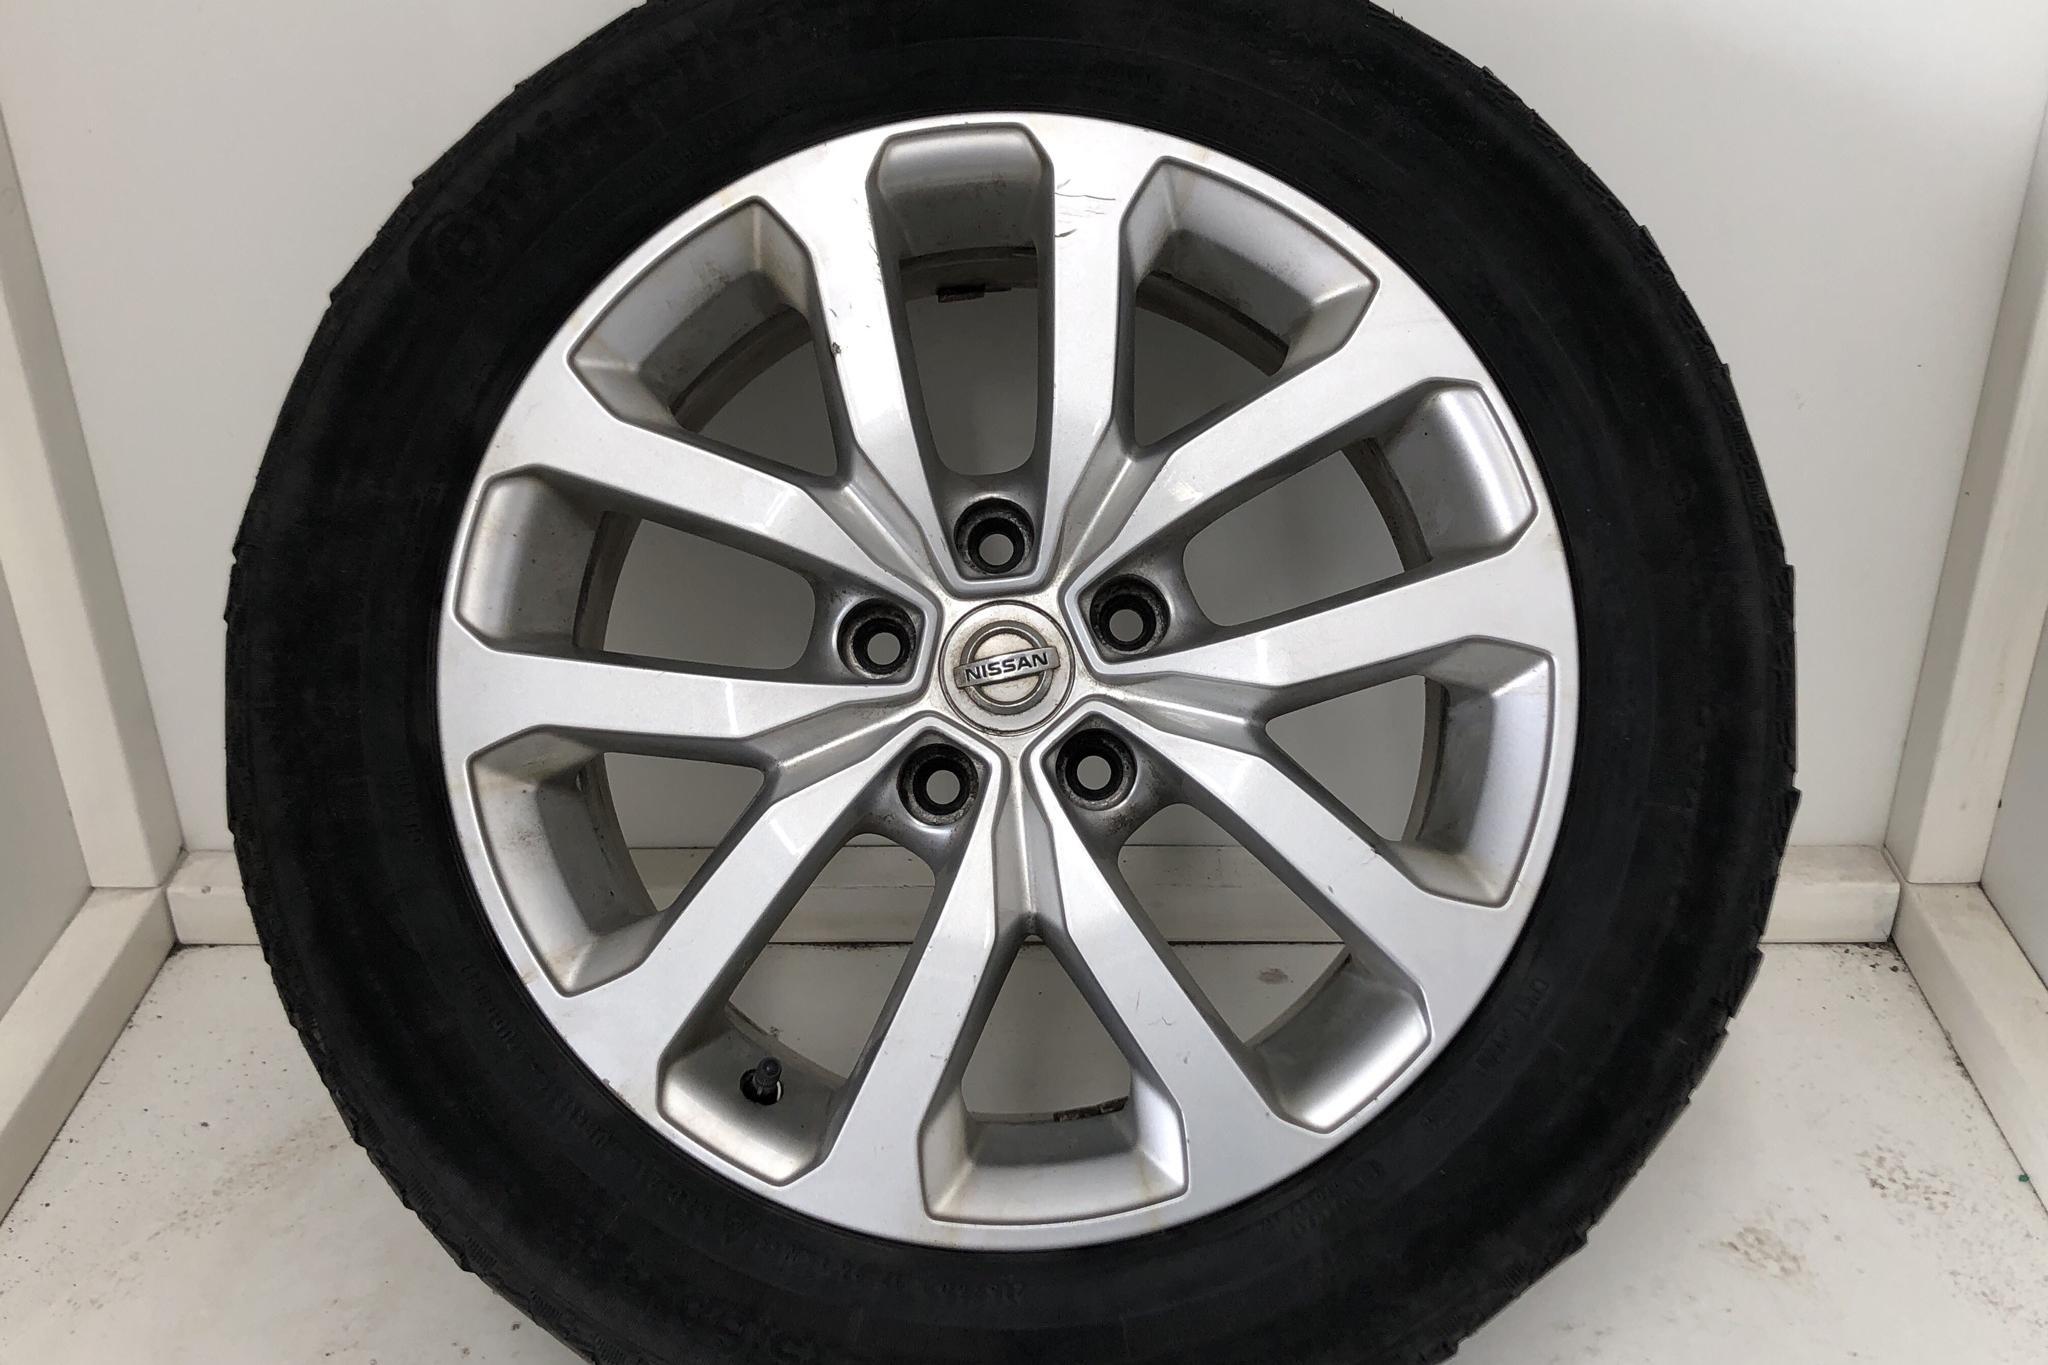 Nissan NV300 1.6 dCi (120hk) - 18 676 mil - Manuell - vit - 2017